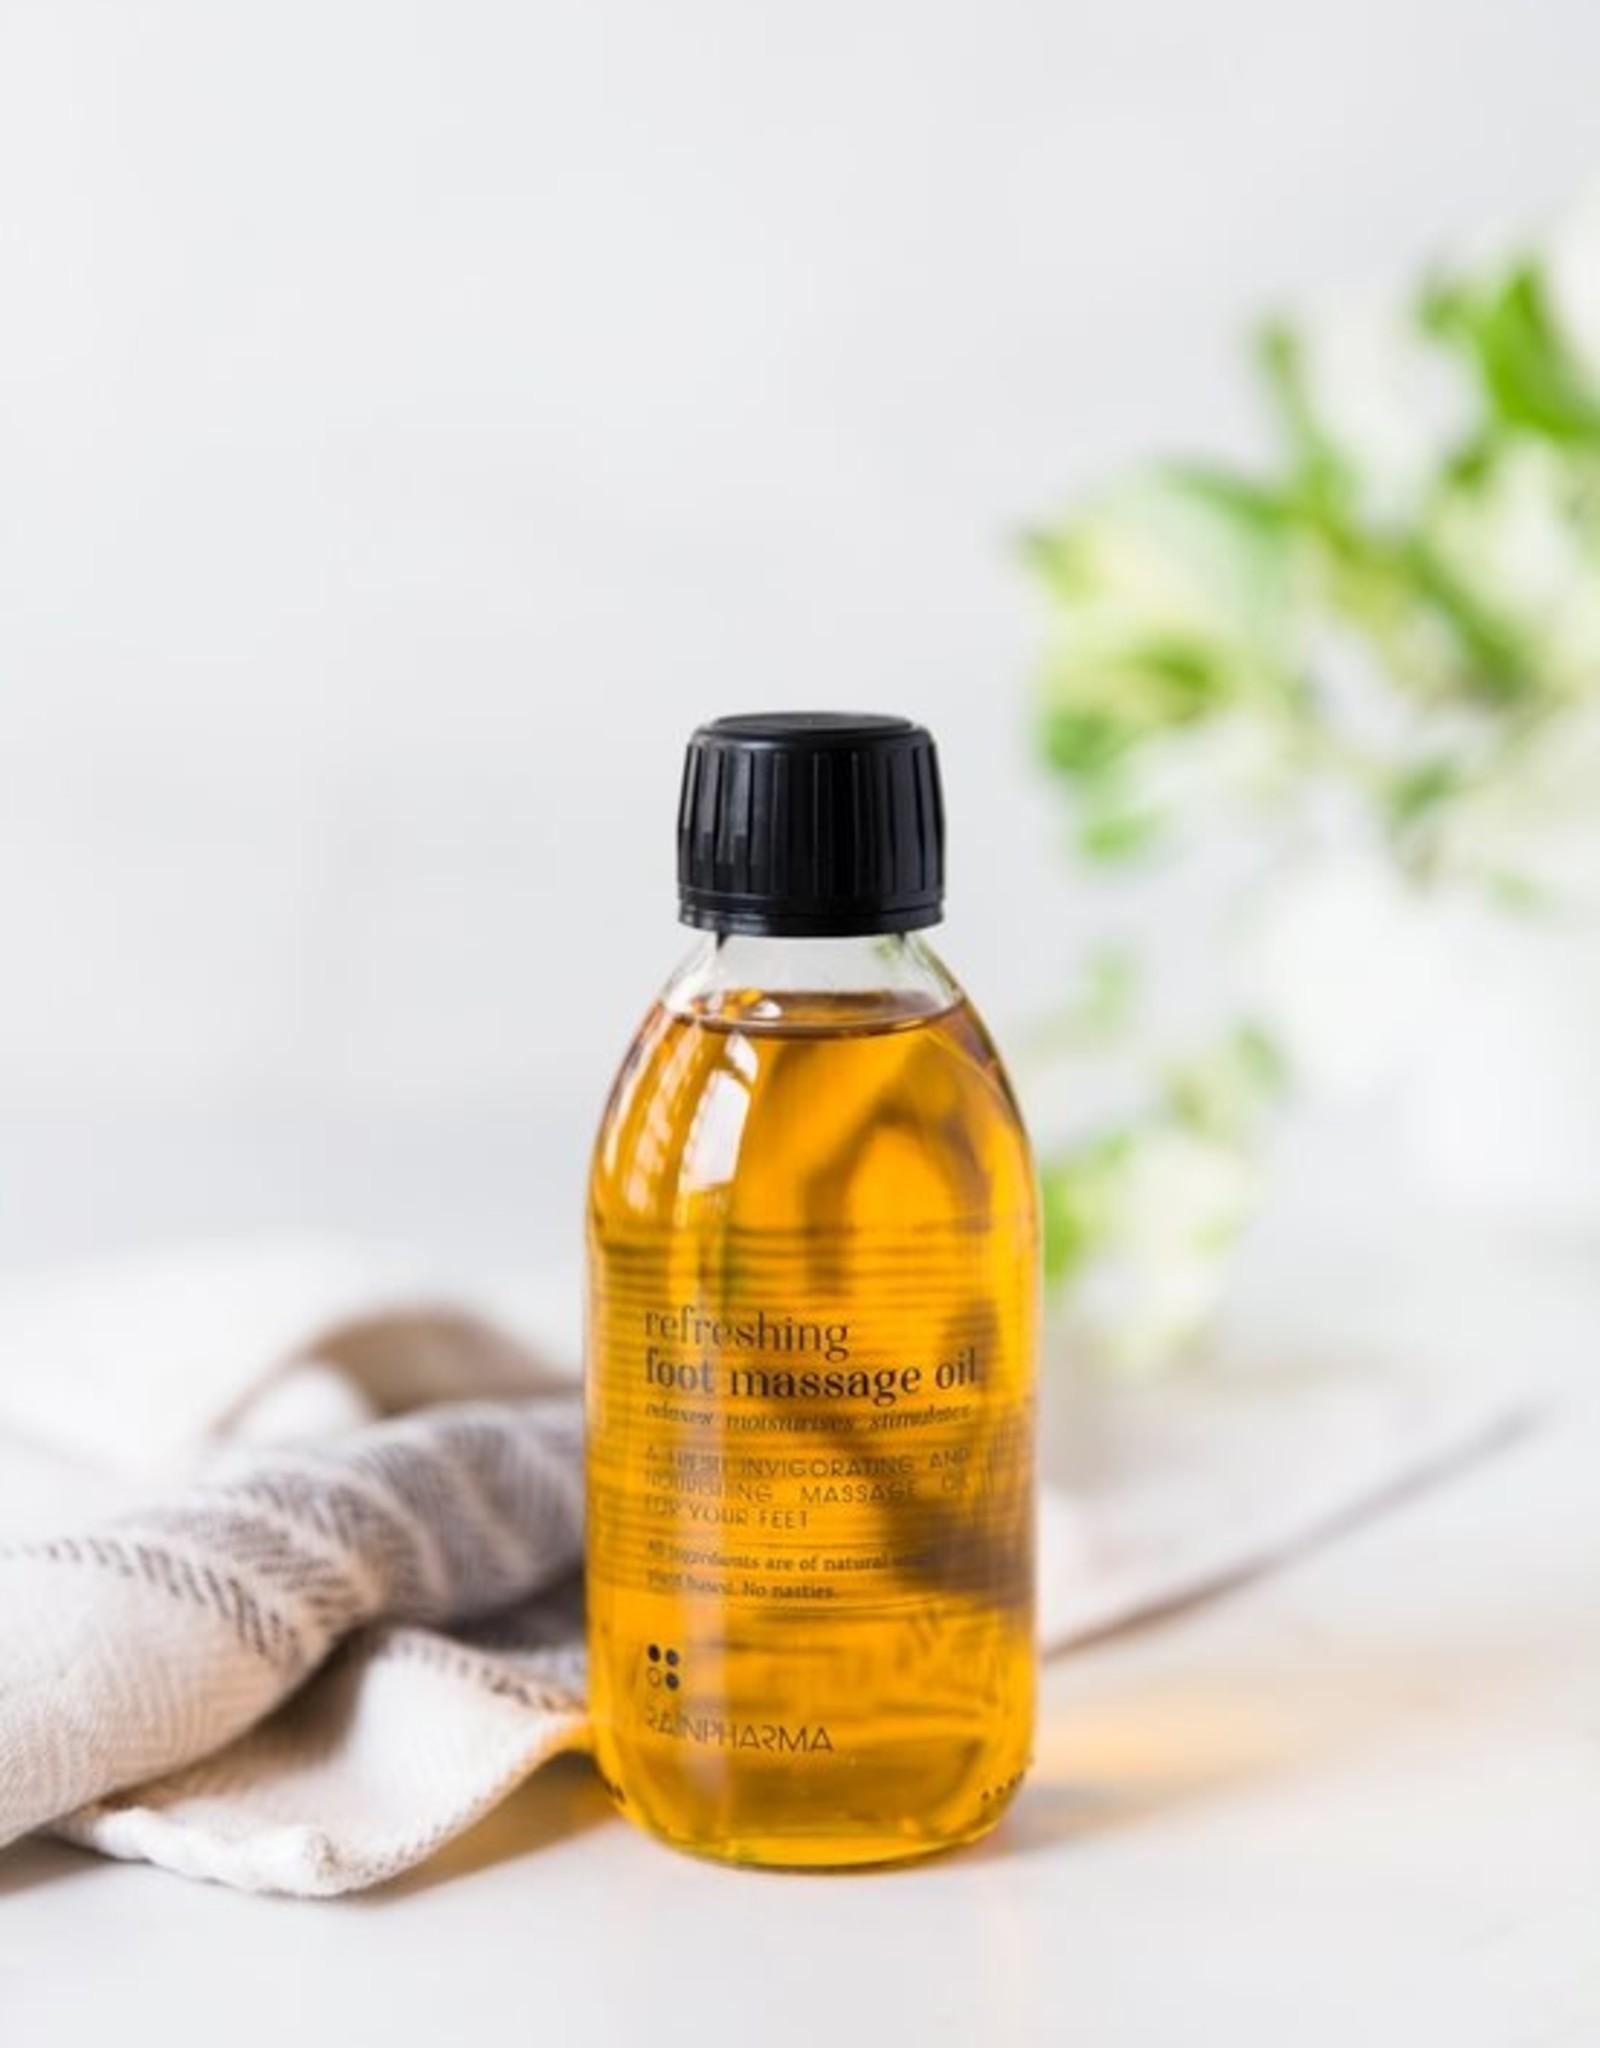 RainPharma Refreshing Foot Massage Oil 200ml - Rainpharma